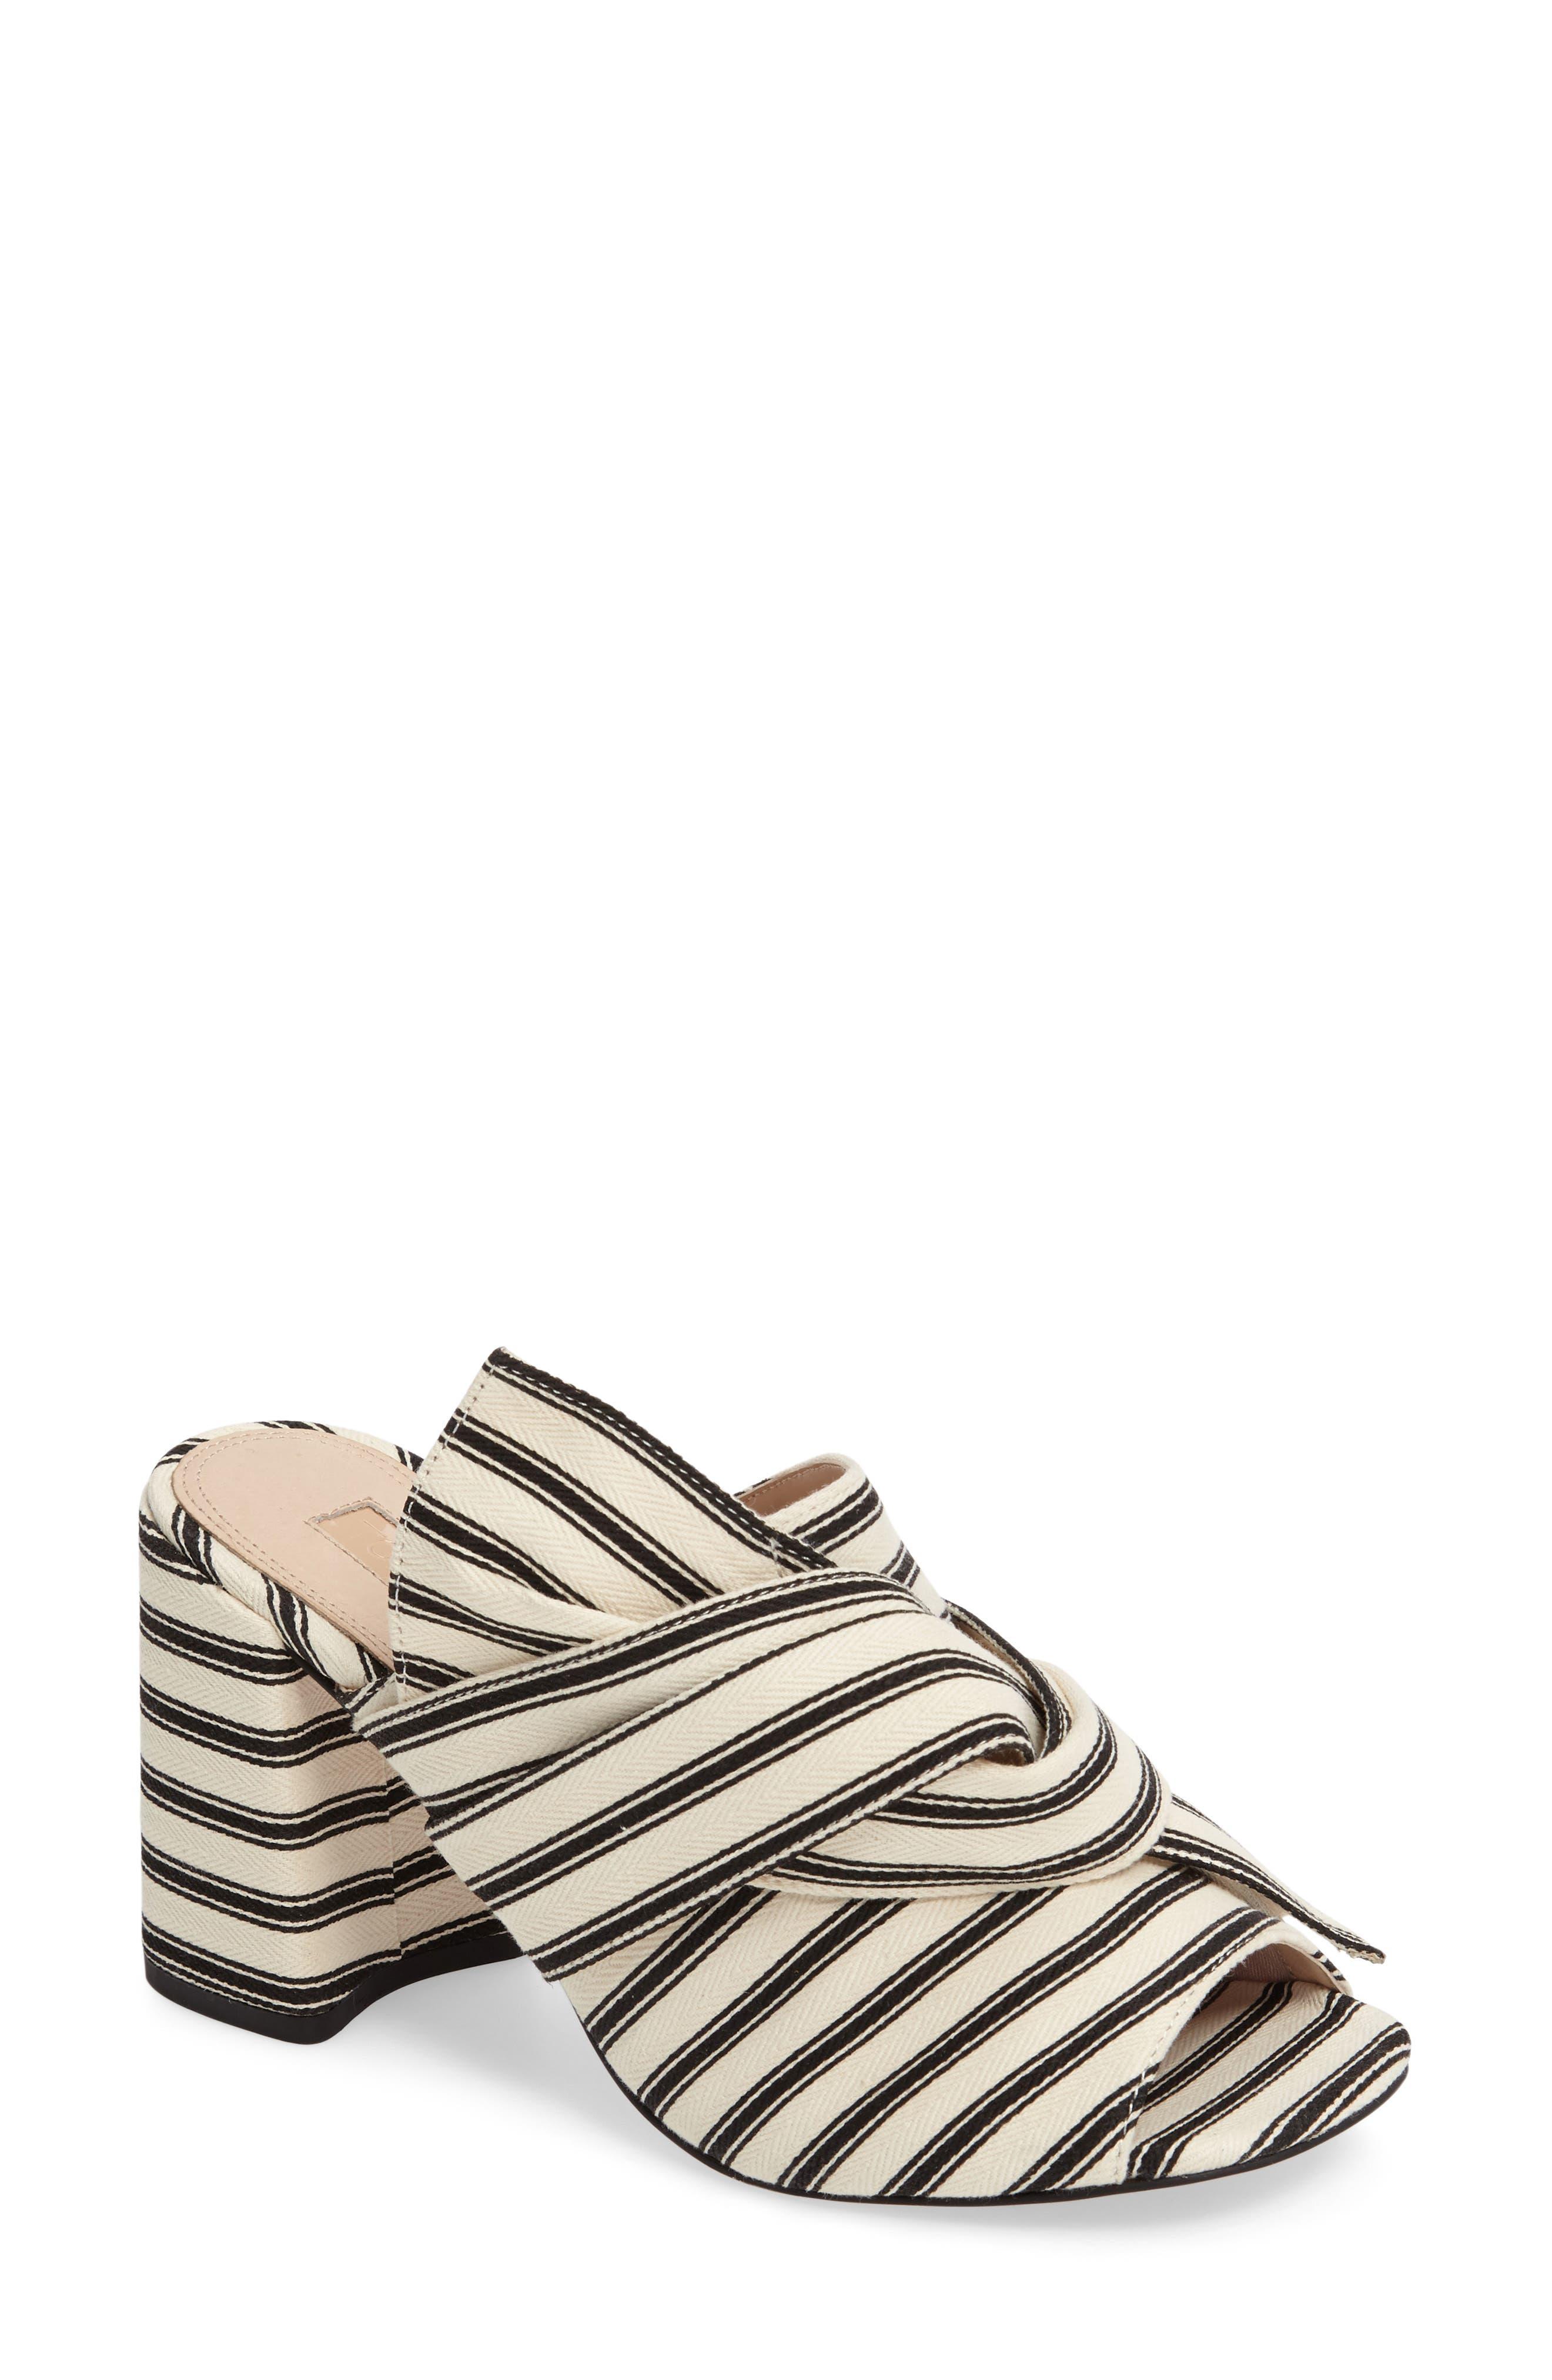 Rome Sandal,                         Main,                         color, White Multi